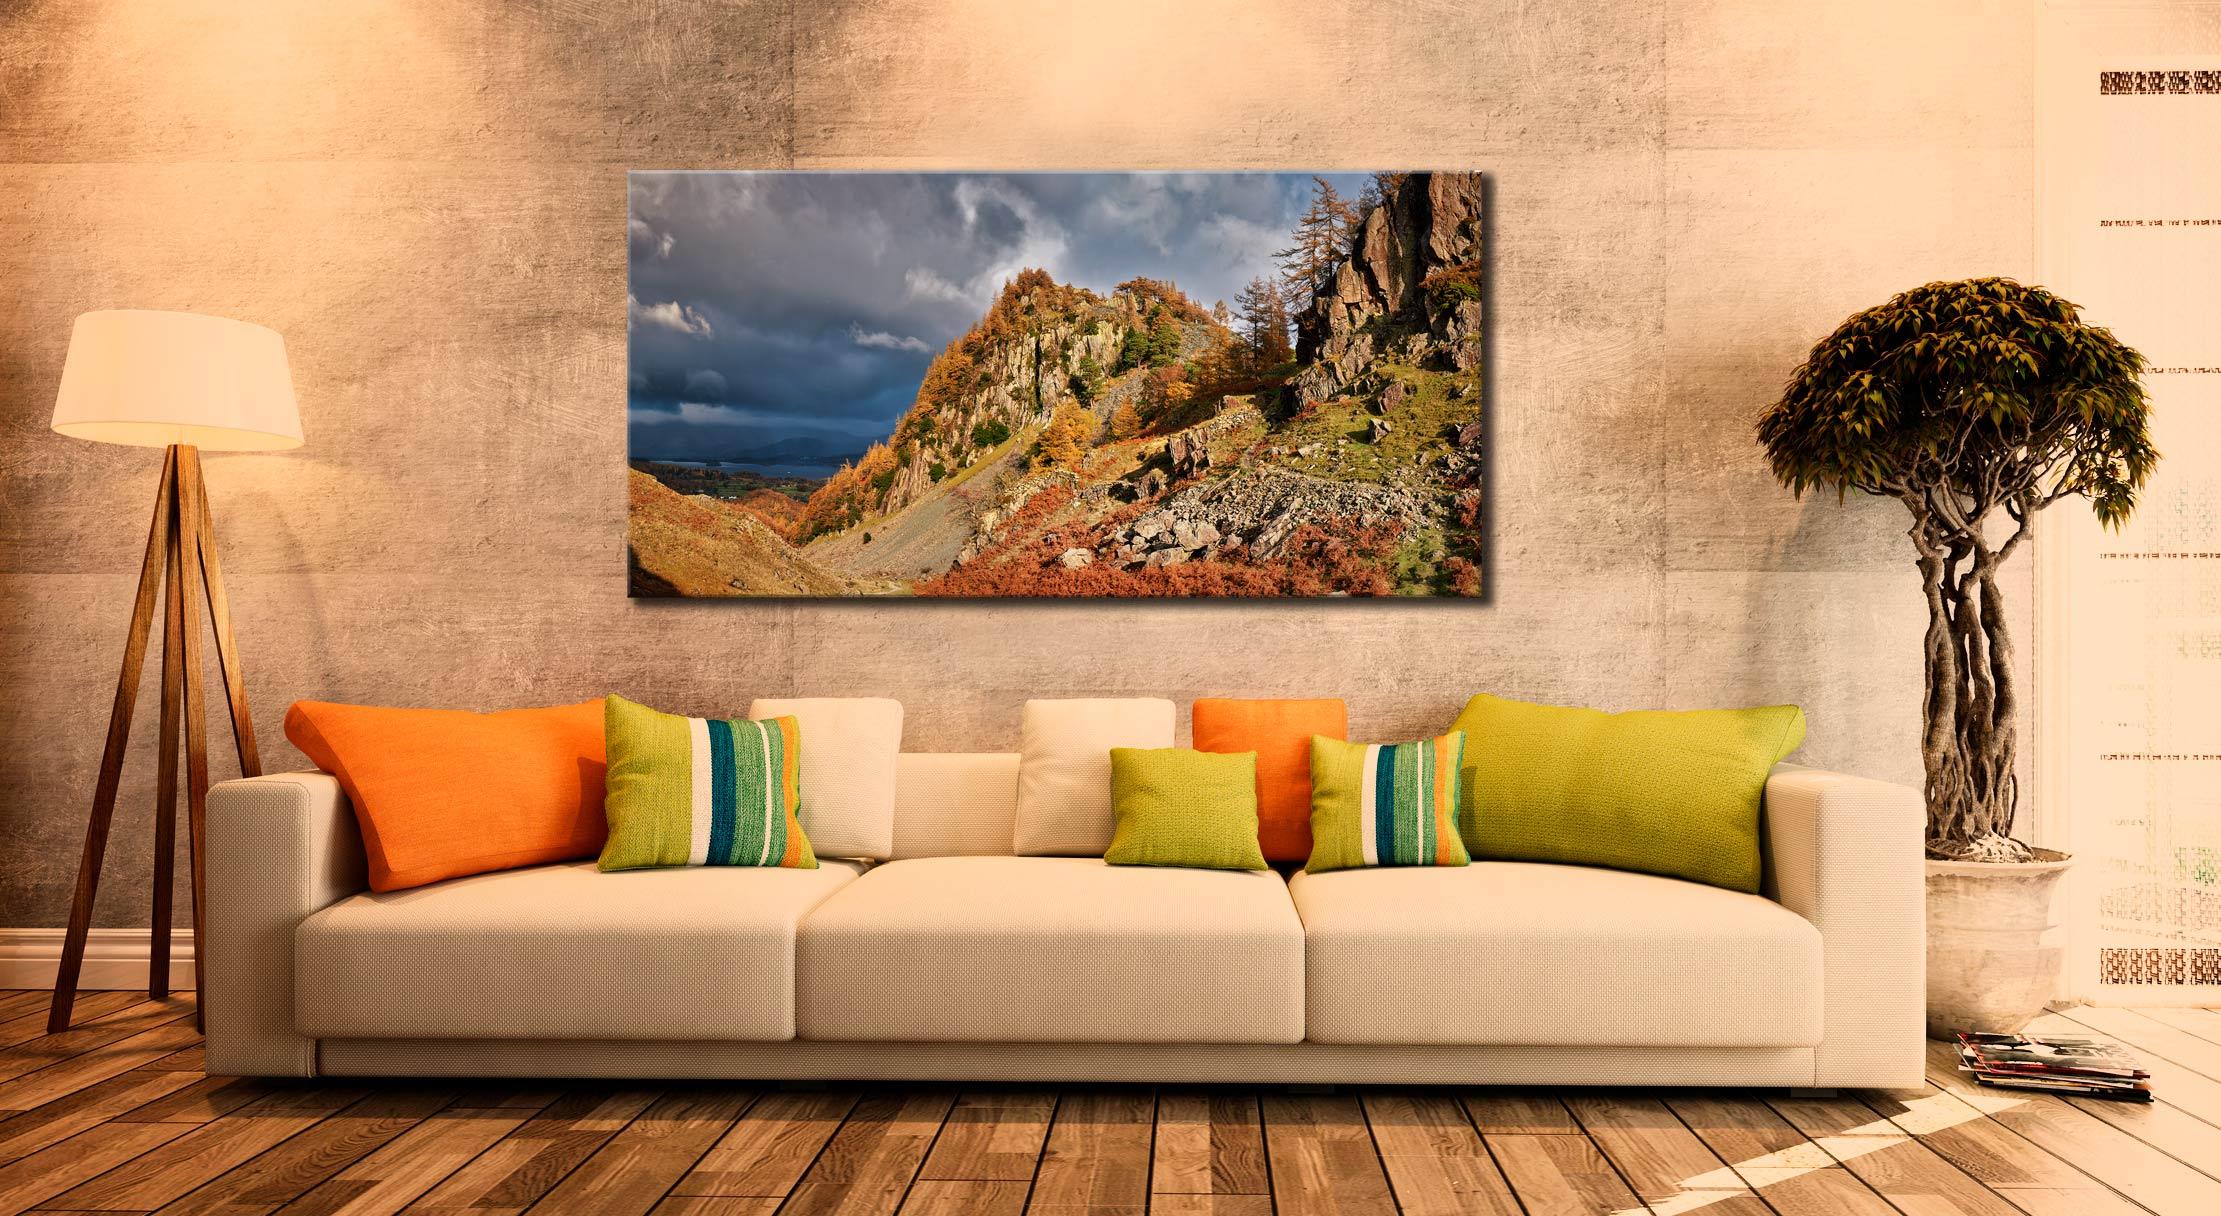 Castle Crag Autumn Sunshine - Canvas Print on Wall